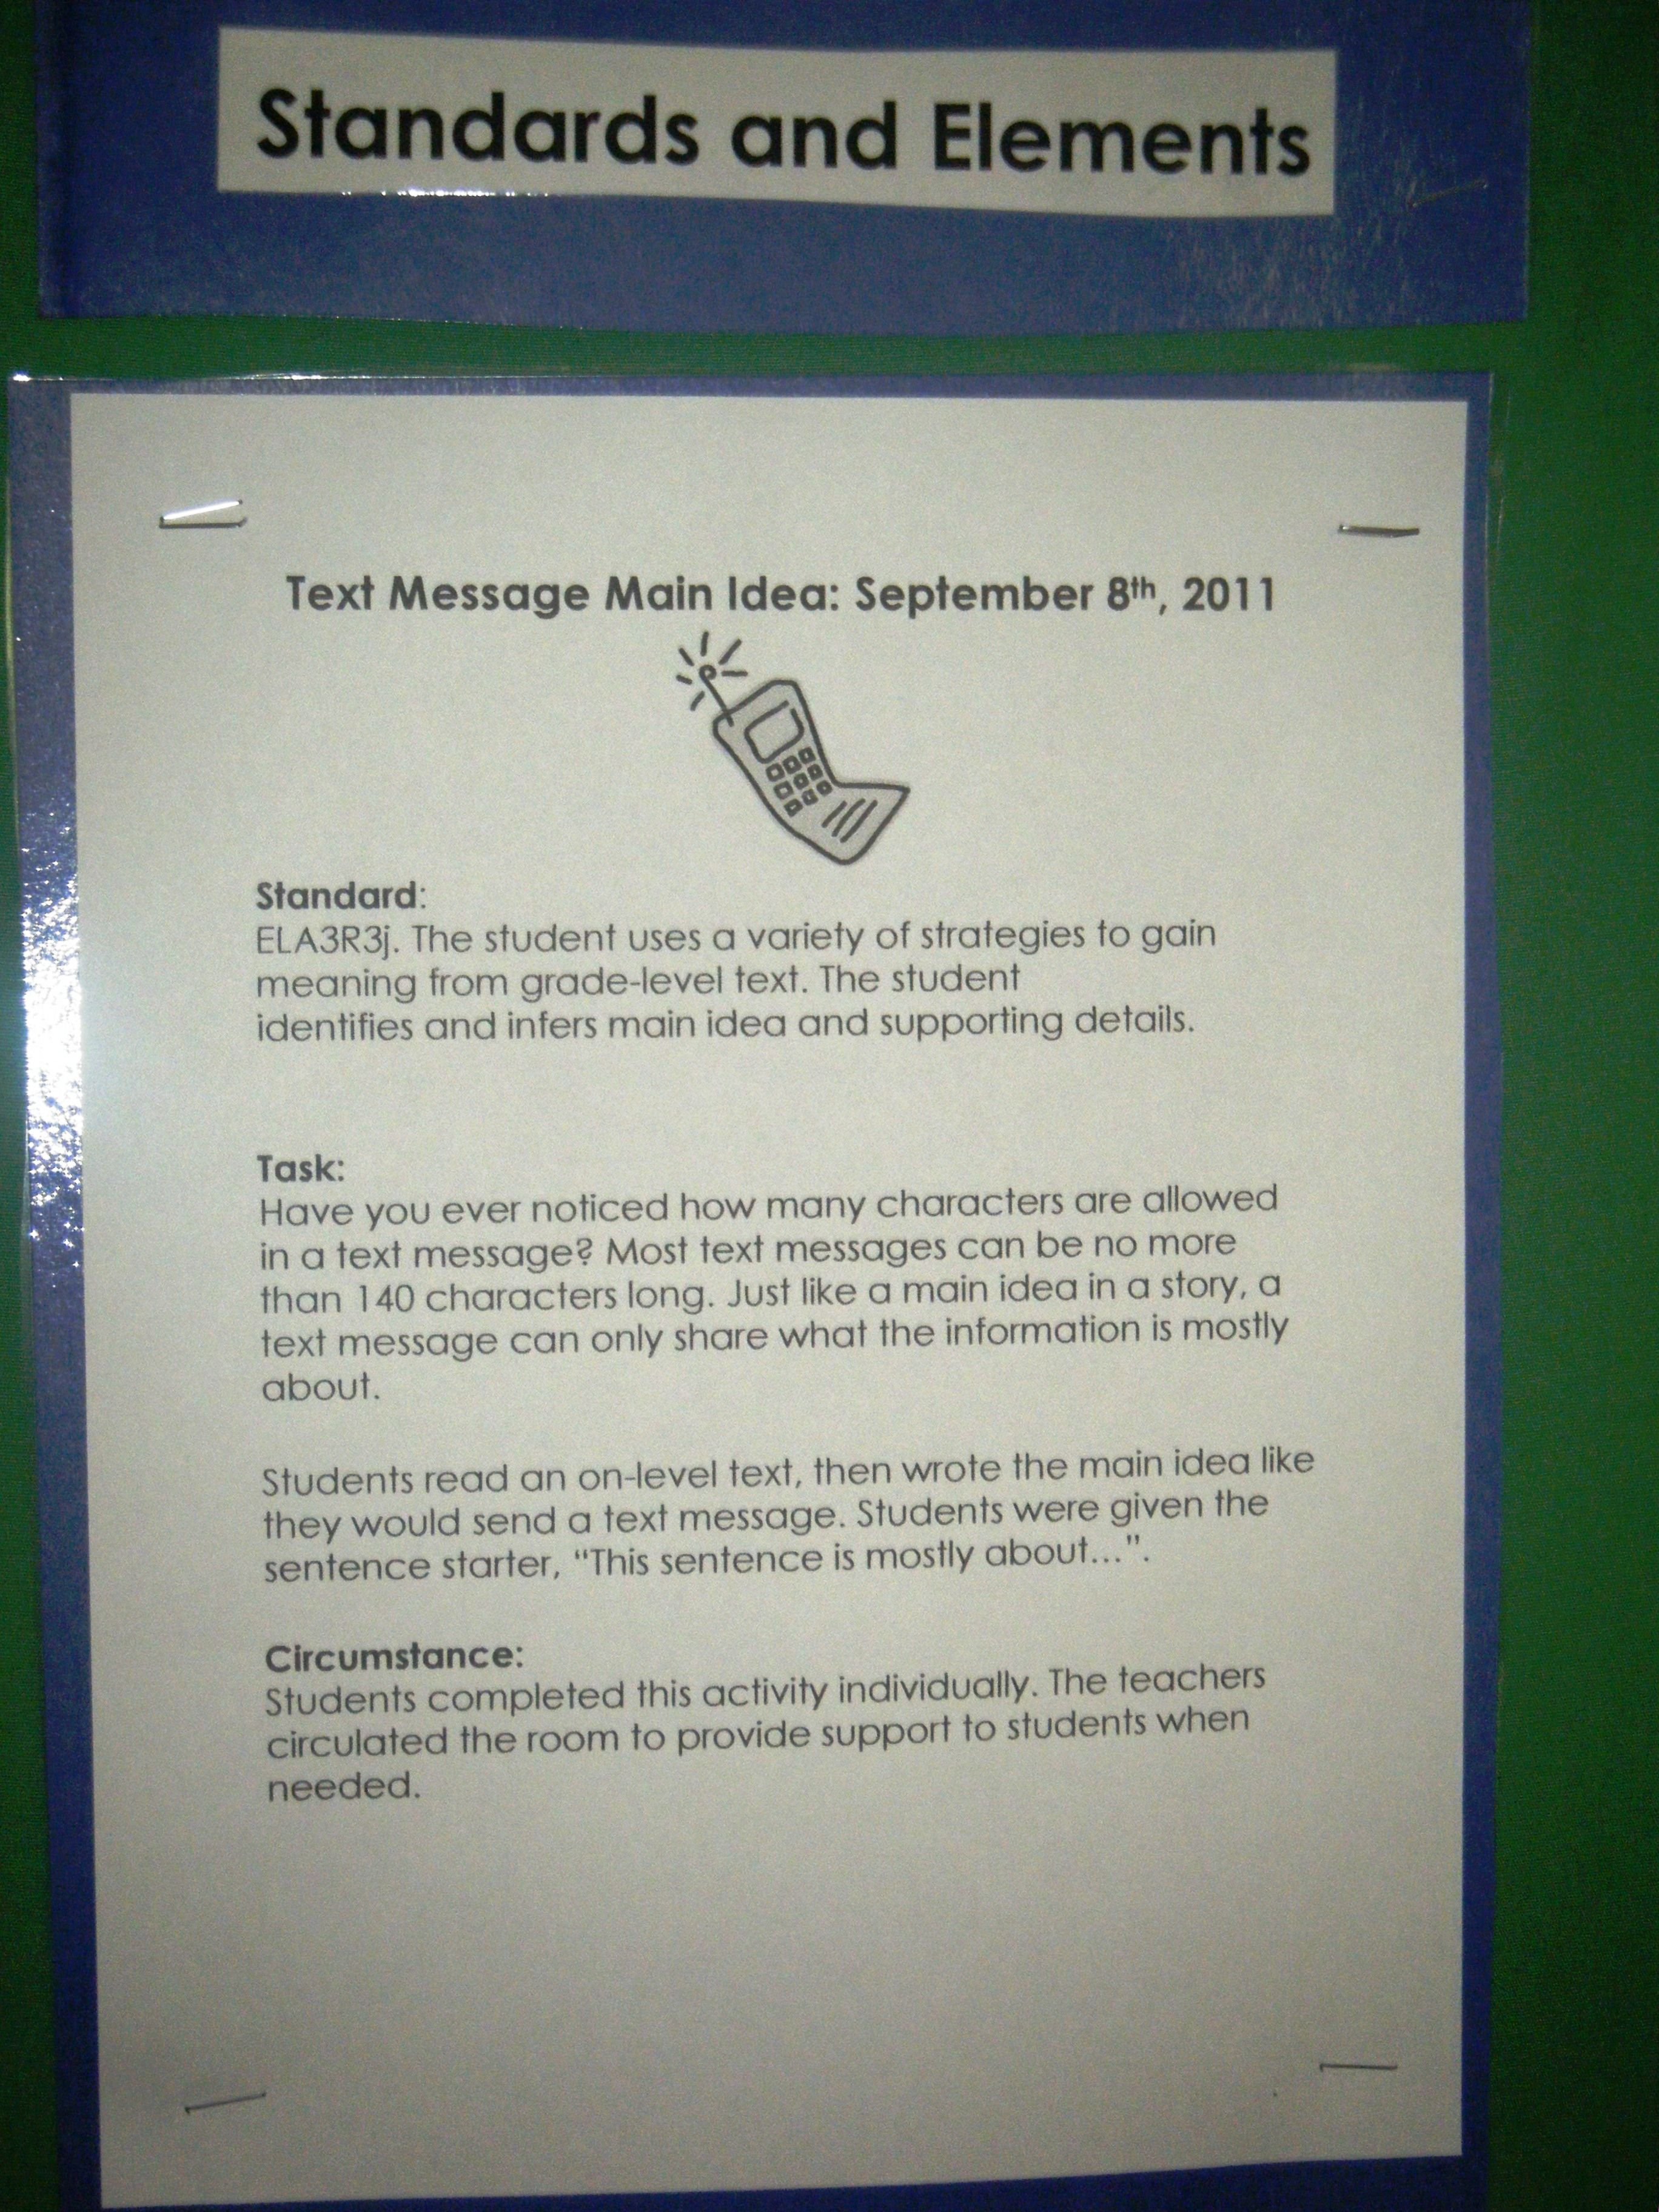 Instructions For The Text Message Main Idea Activity Speech And Language Main Idea Activities Reading Main Idea